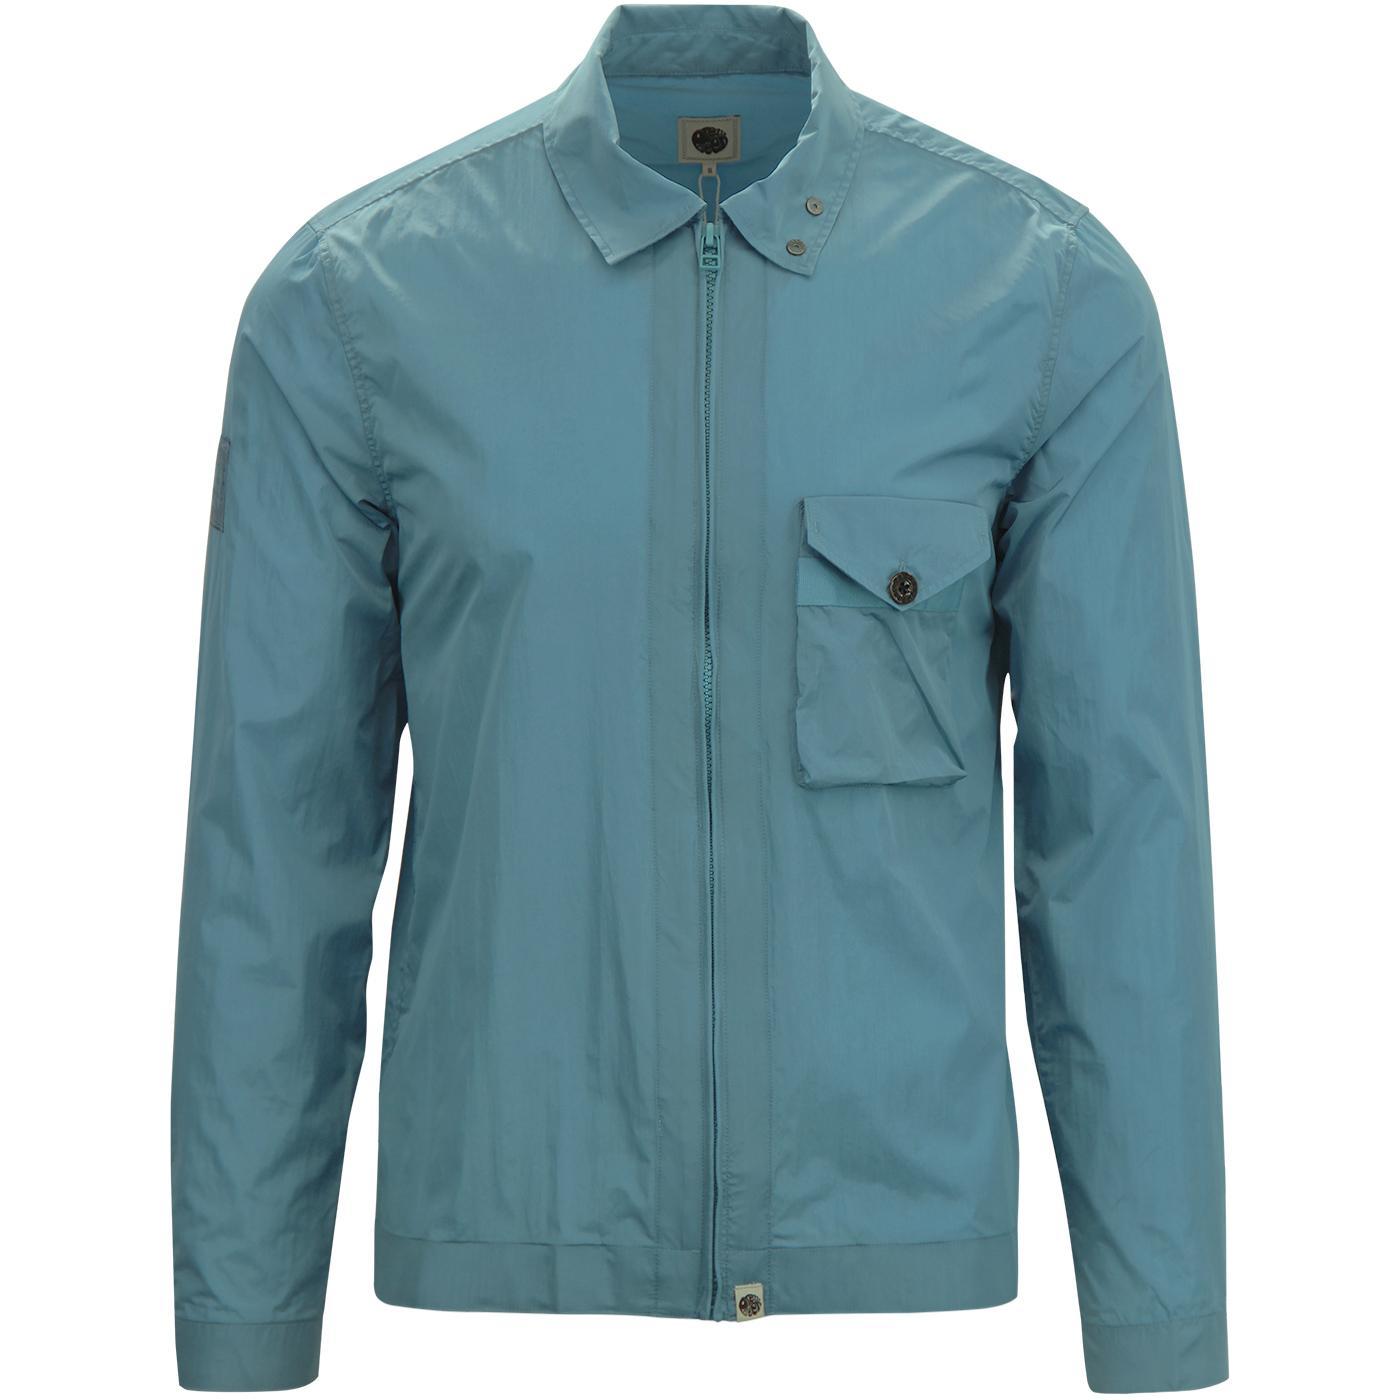 PRETTY GREEN Retro Mod Iridescent Overshirt Jacket